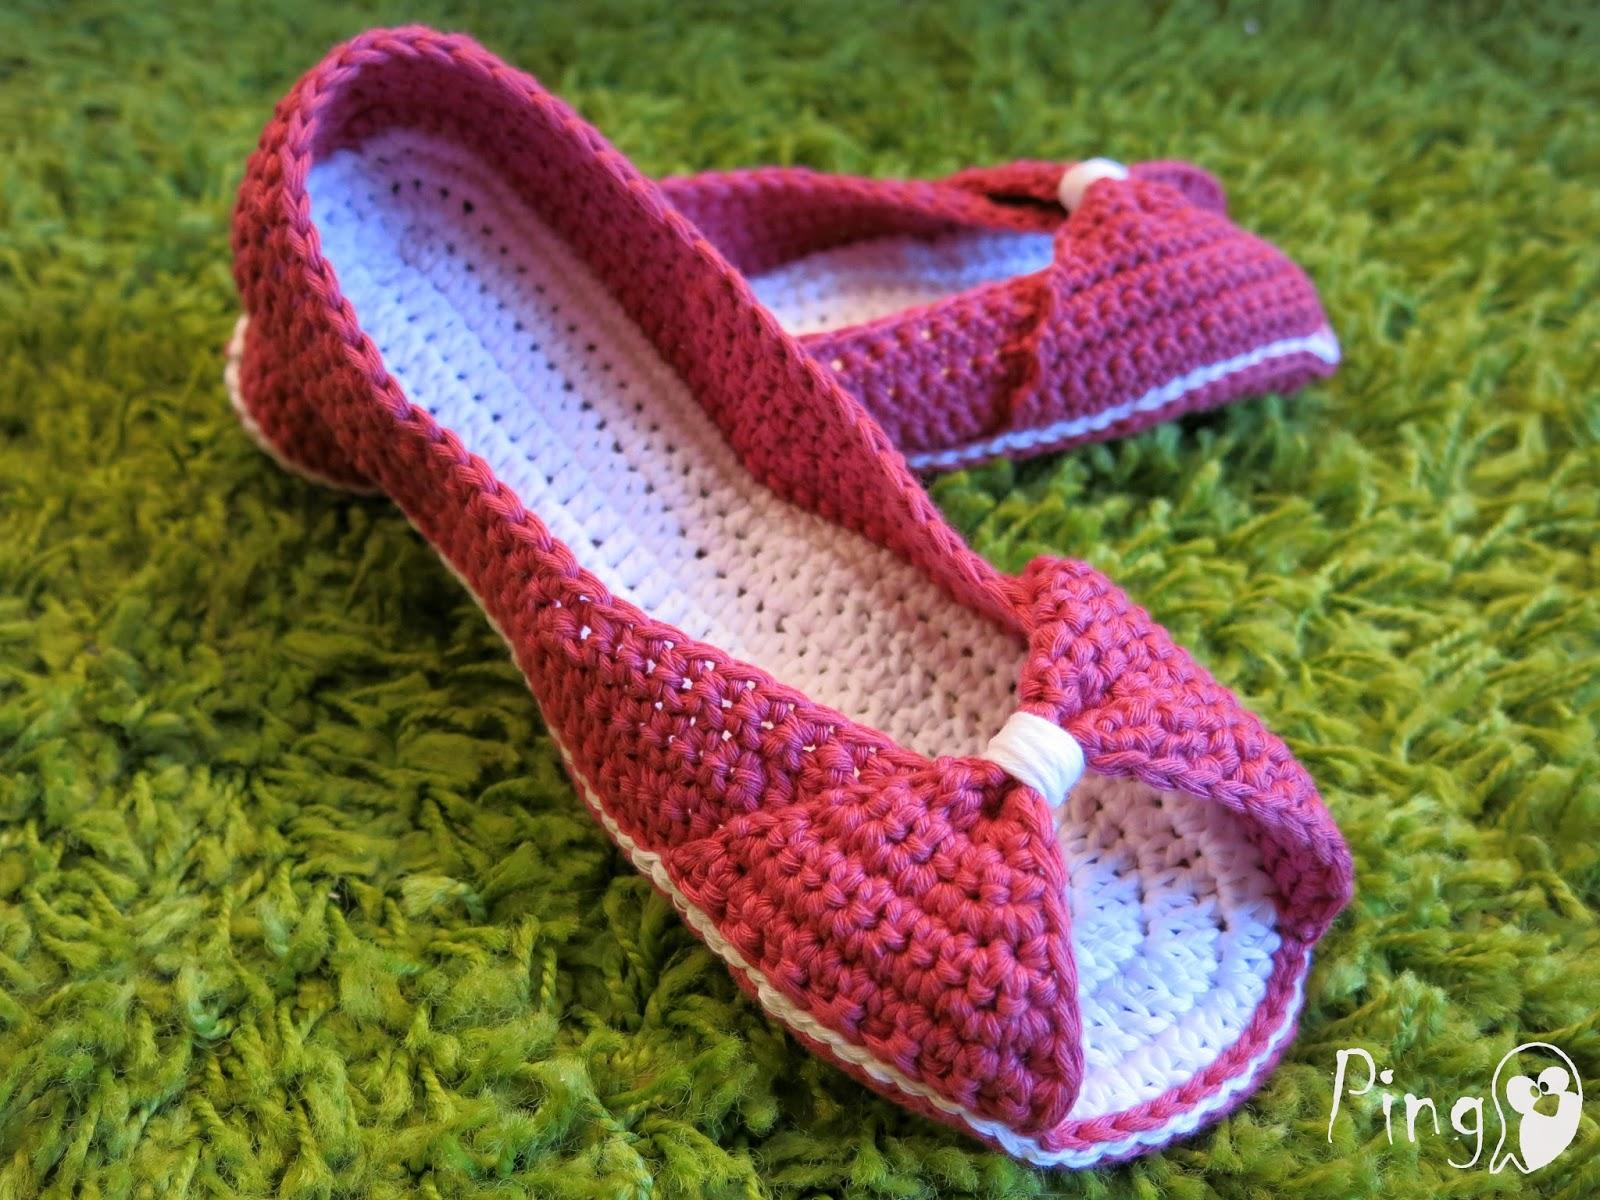 Pingo - The Pink Penguin: Princess Slippers :o)